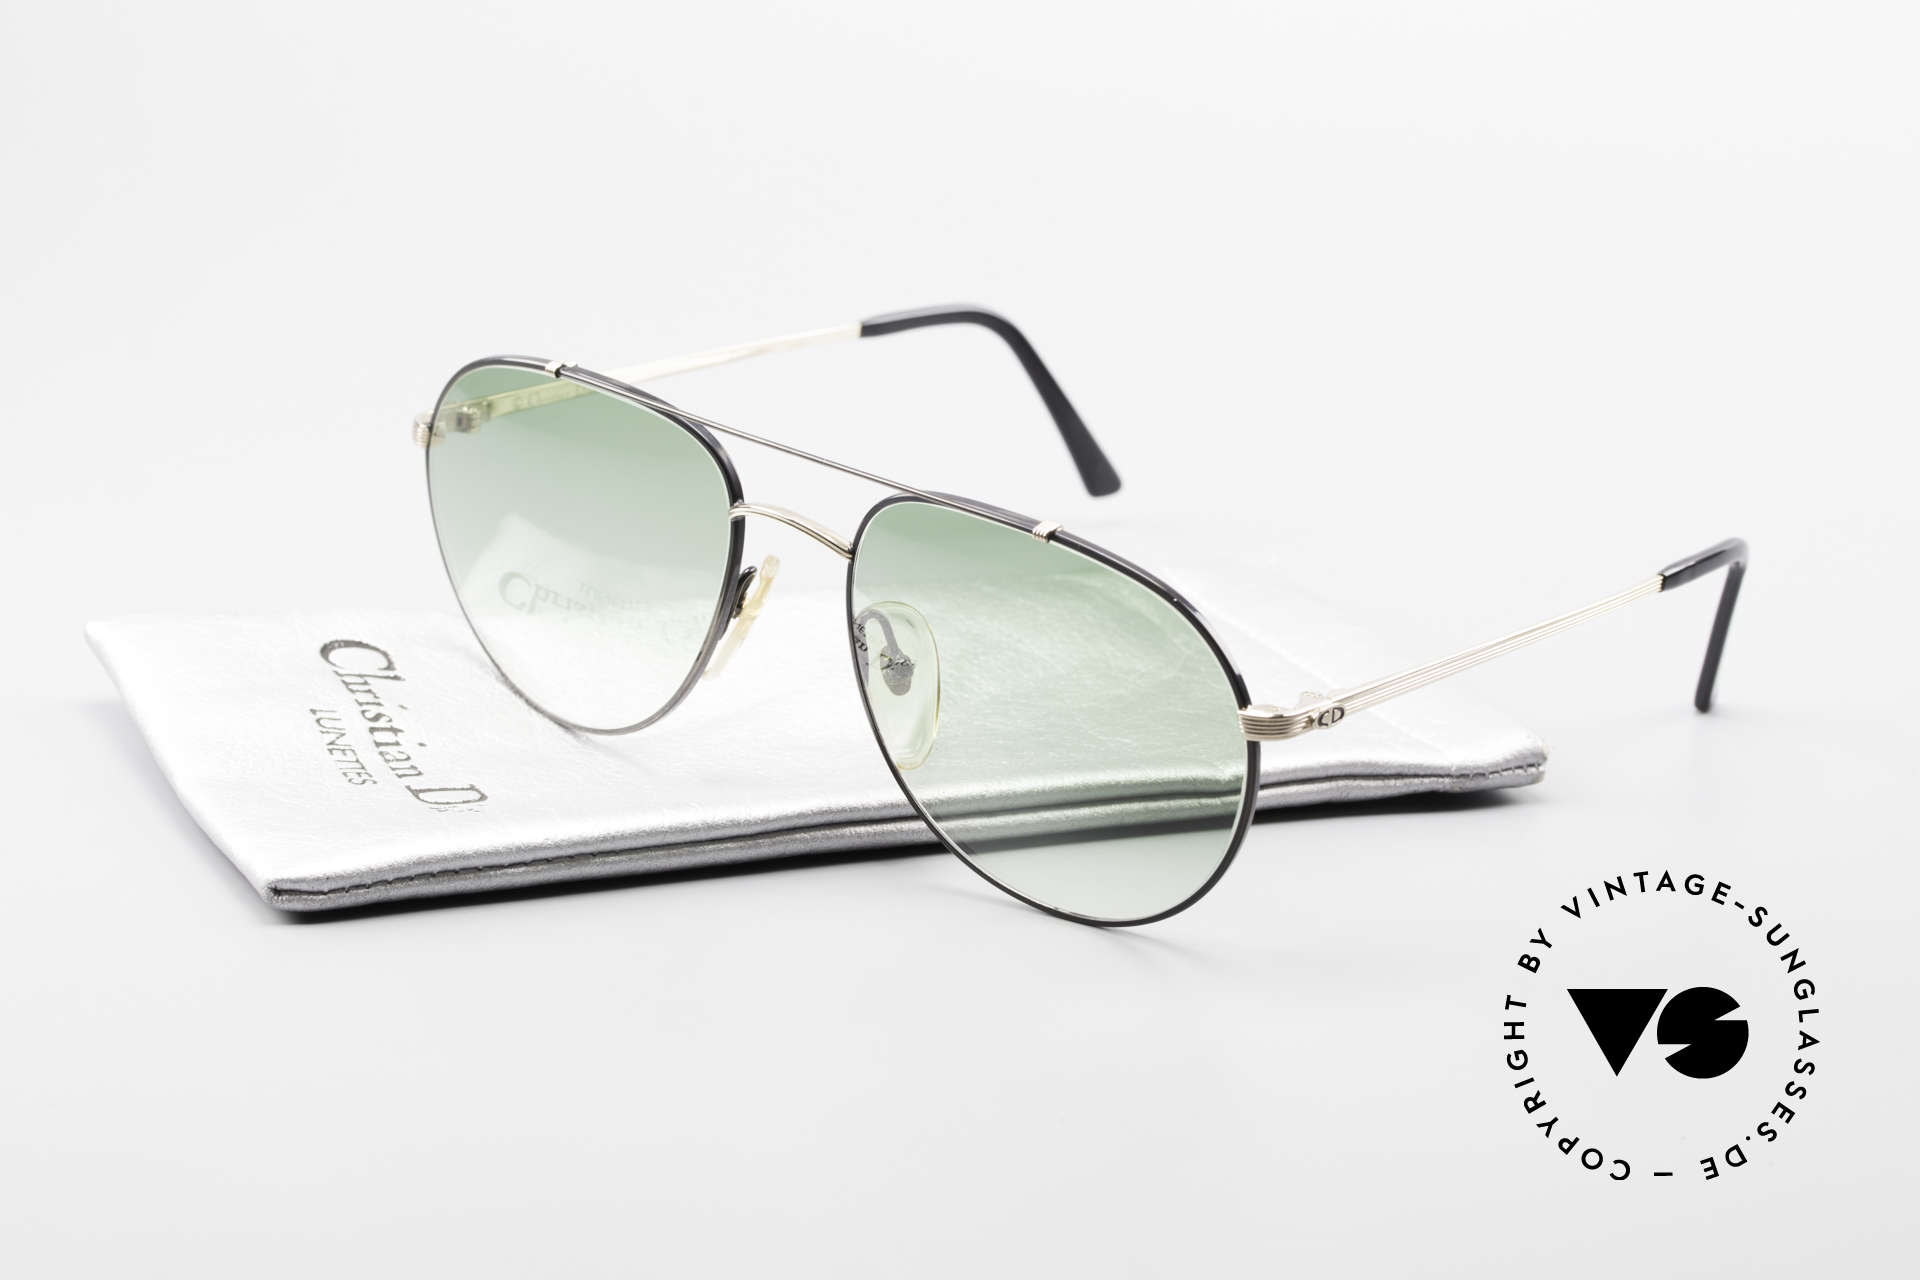 Christian Dior 2488 Rare 80's Aviator Sunglasses, Size: large, Made for Men